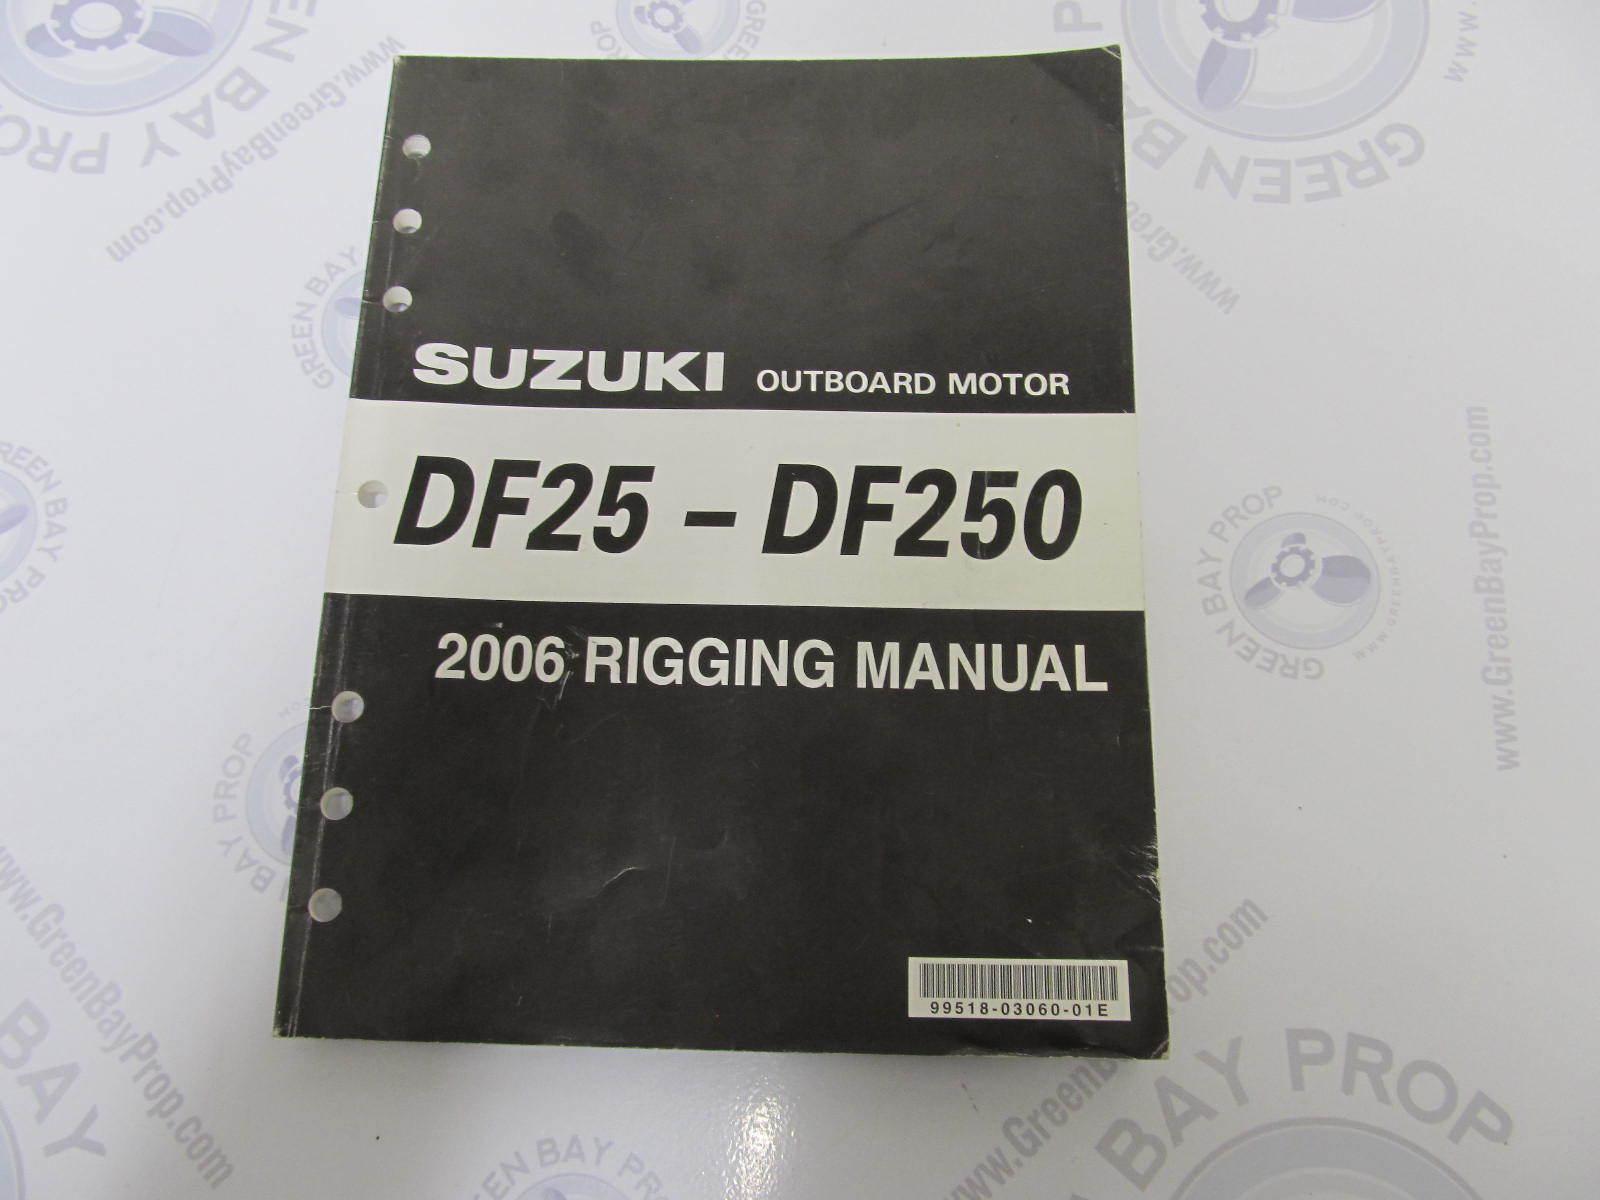 Download suzuki Df250 manual